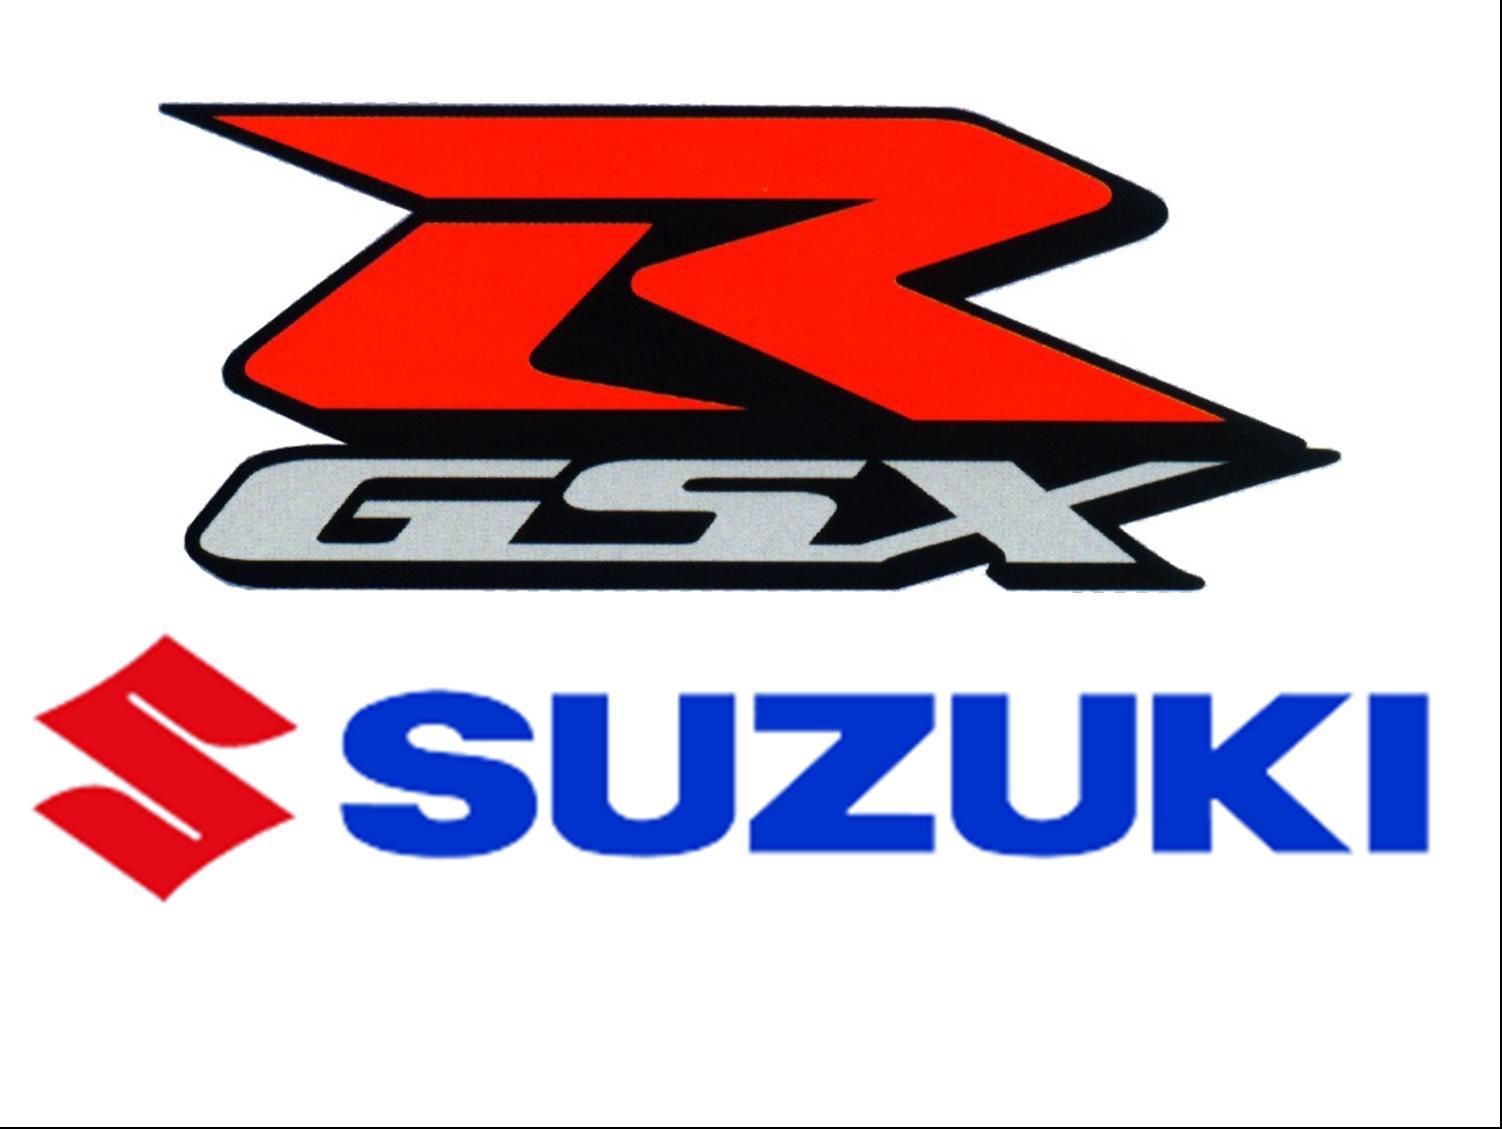 Suzuki Motorcycle Logo